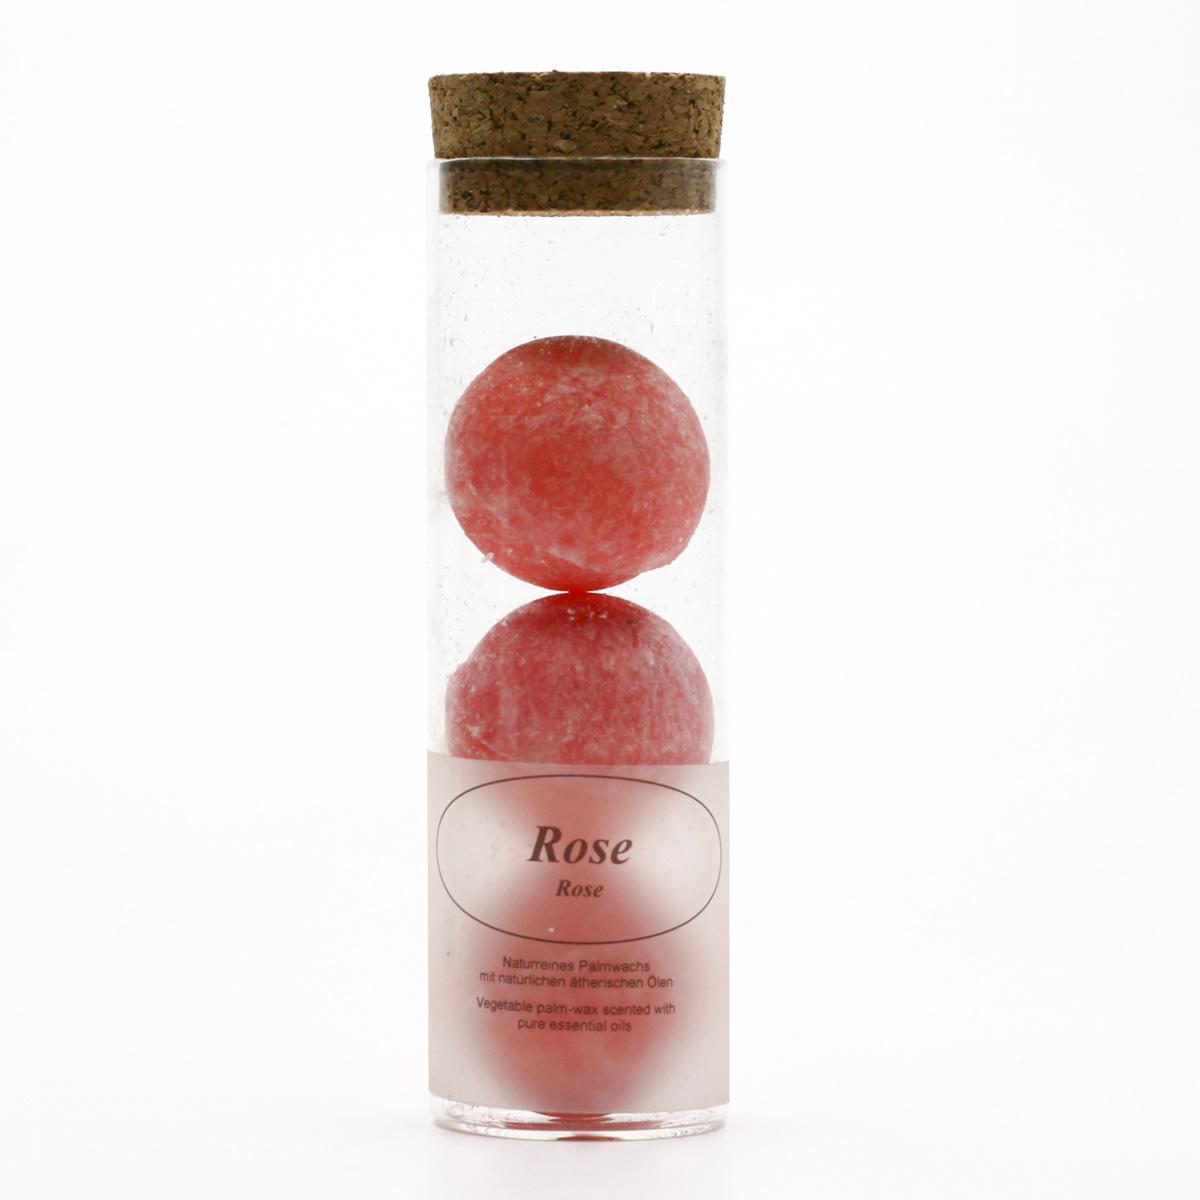 Kerzenfarm Kapsle do aromalampy, Rose 6 ks, dóza